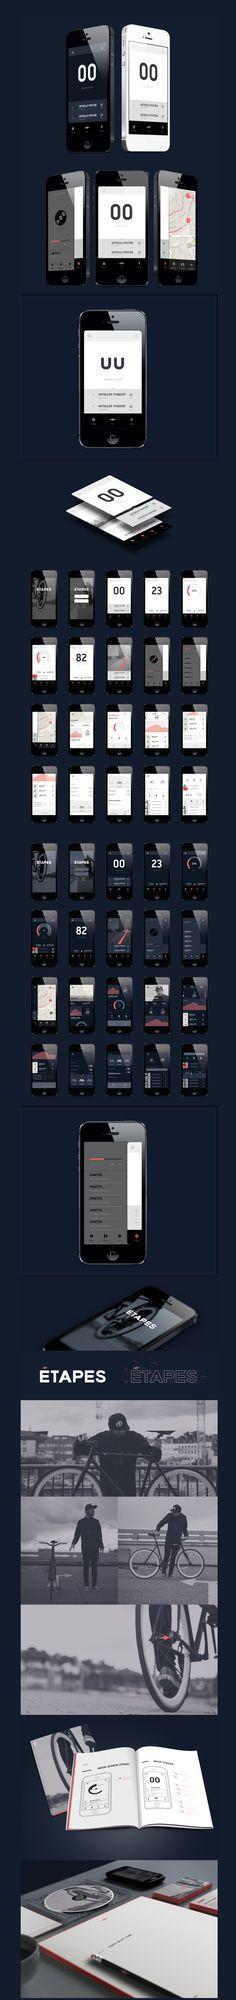 http://www.behance.net/gallery/etapes-App/9442171 #ios #apps #mobiledesign #design #interactive